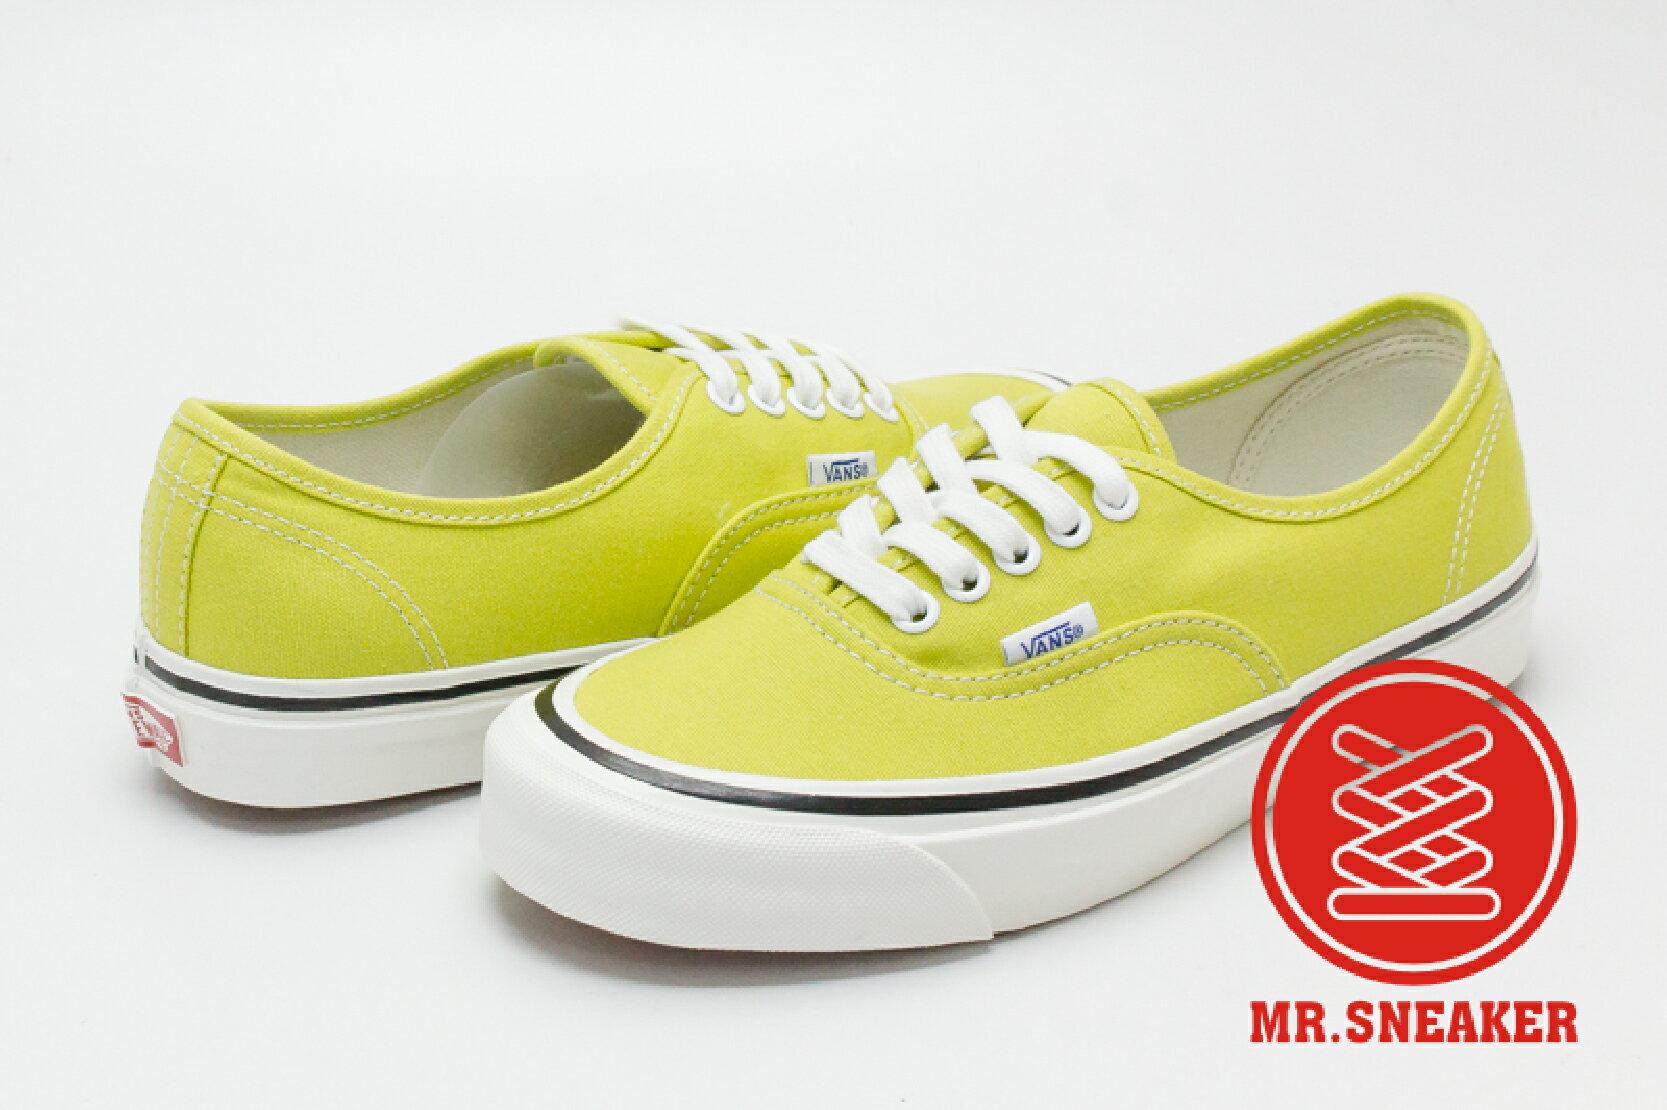 ☆Mr.Sneaker☆ VANS Anaheim Factory Authentic 44 DX 黃綠 女段